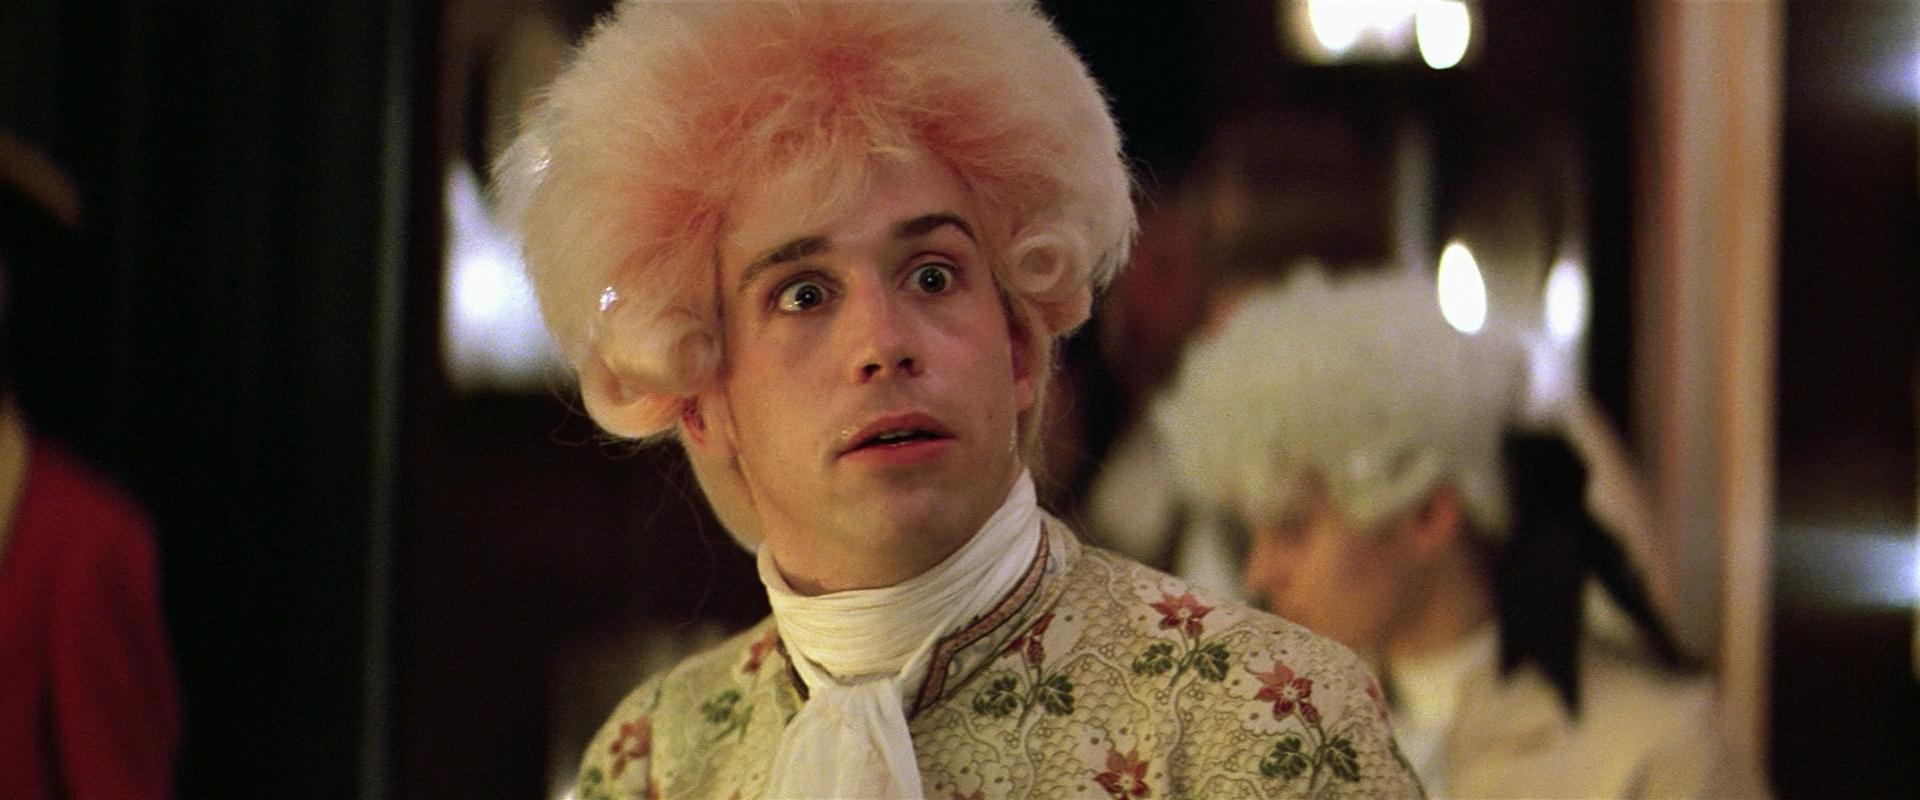 Amadeus (1984) - Movie Review : Alternate Ending